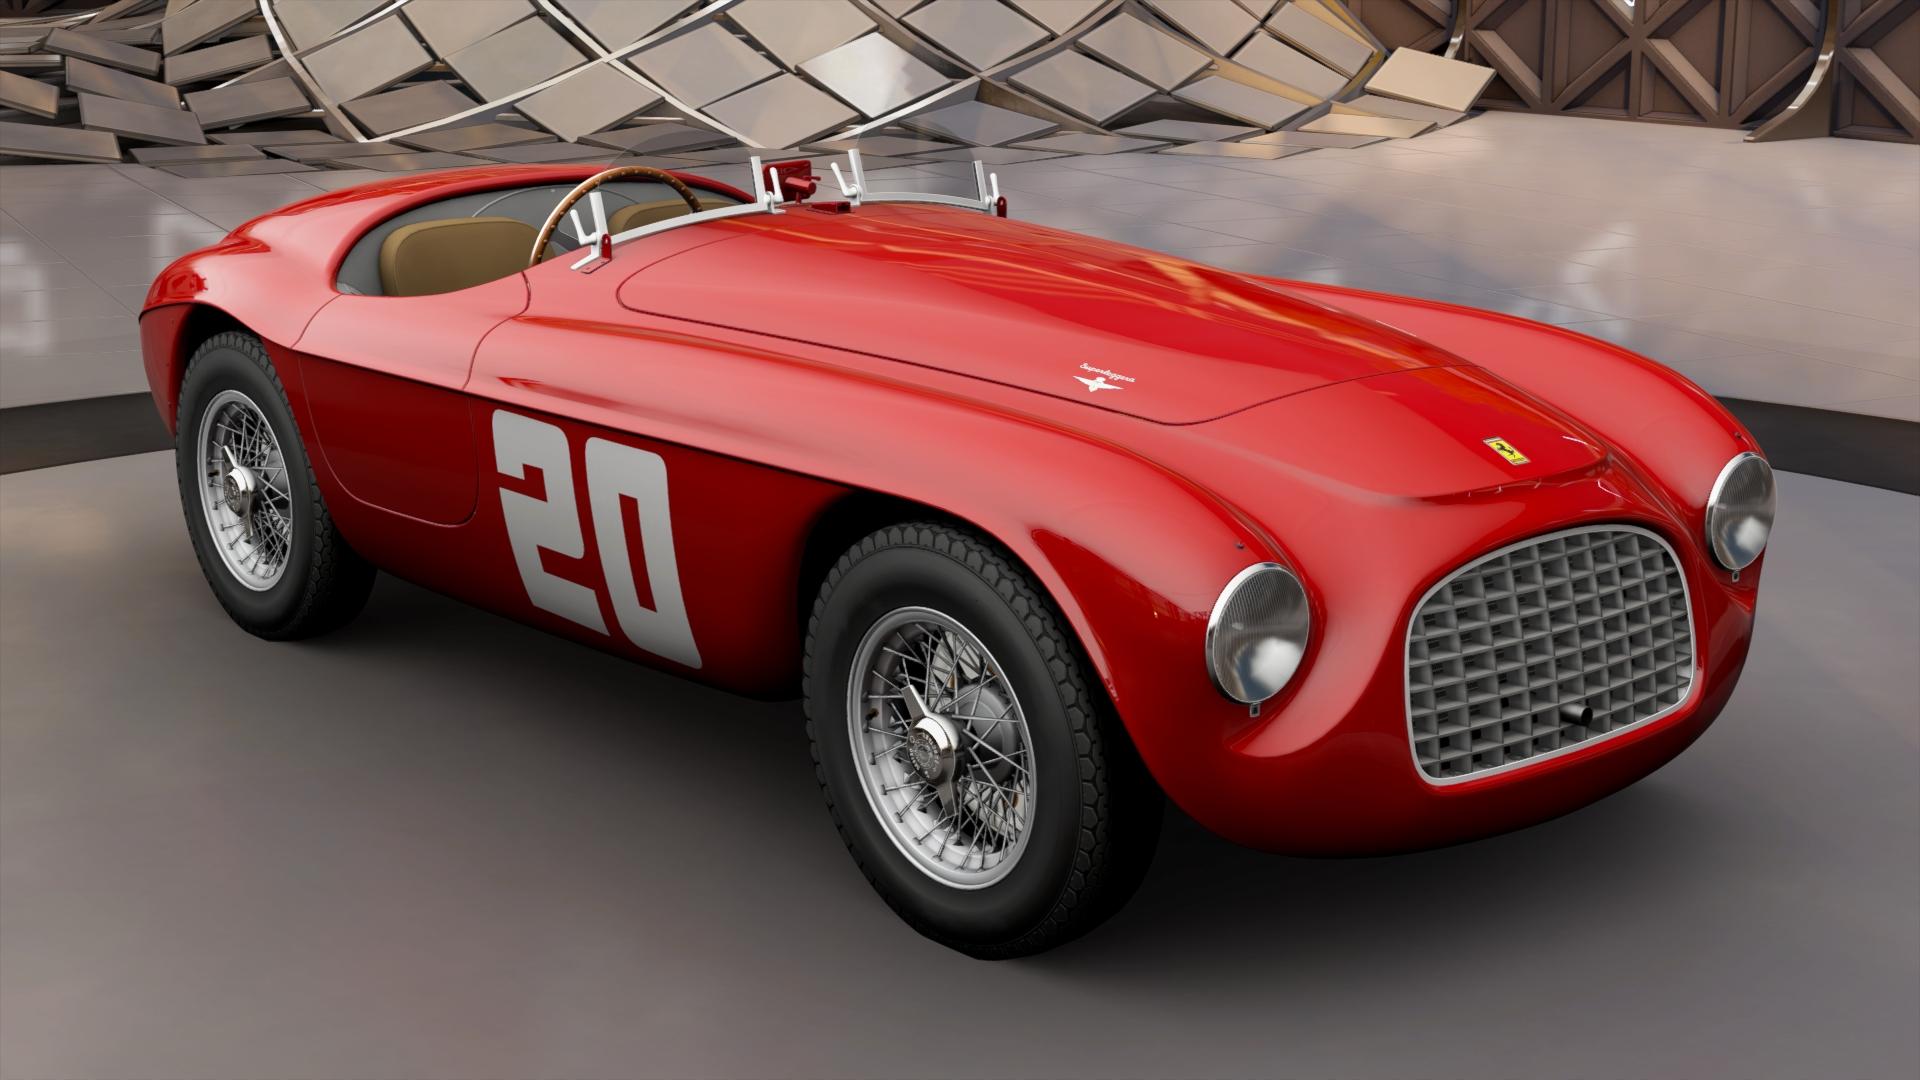 Ferrari 166mm Barchetta Forza Motorsport Wiki Fandom Powered By